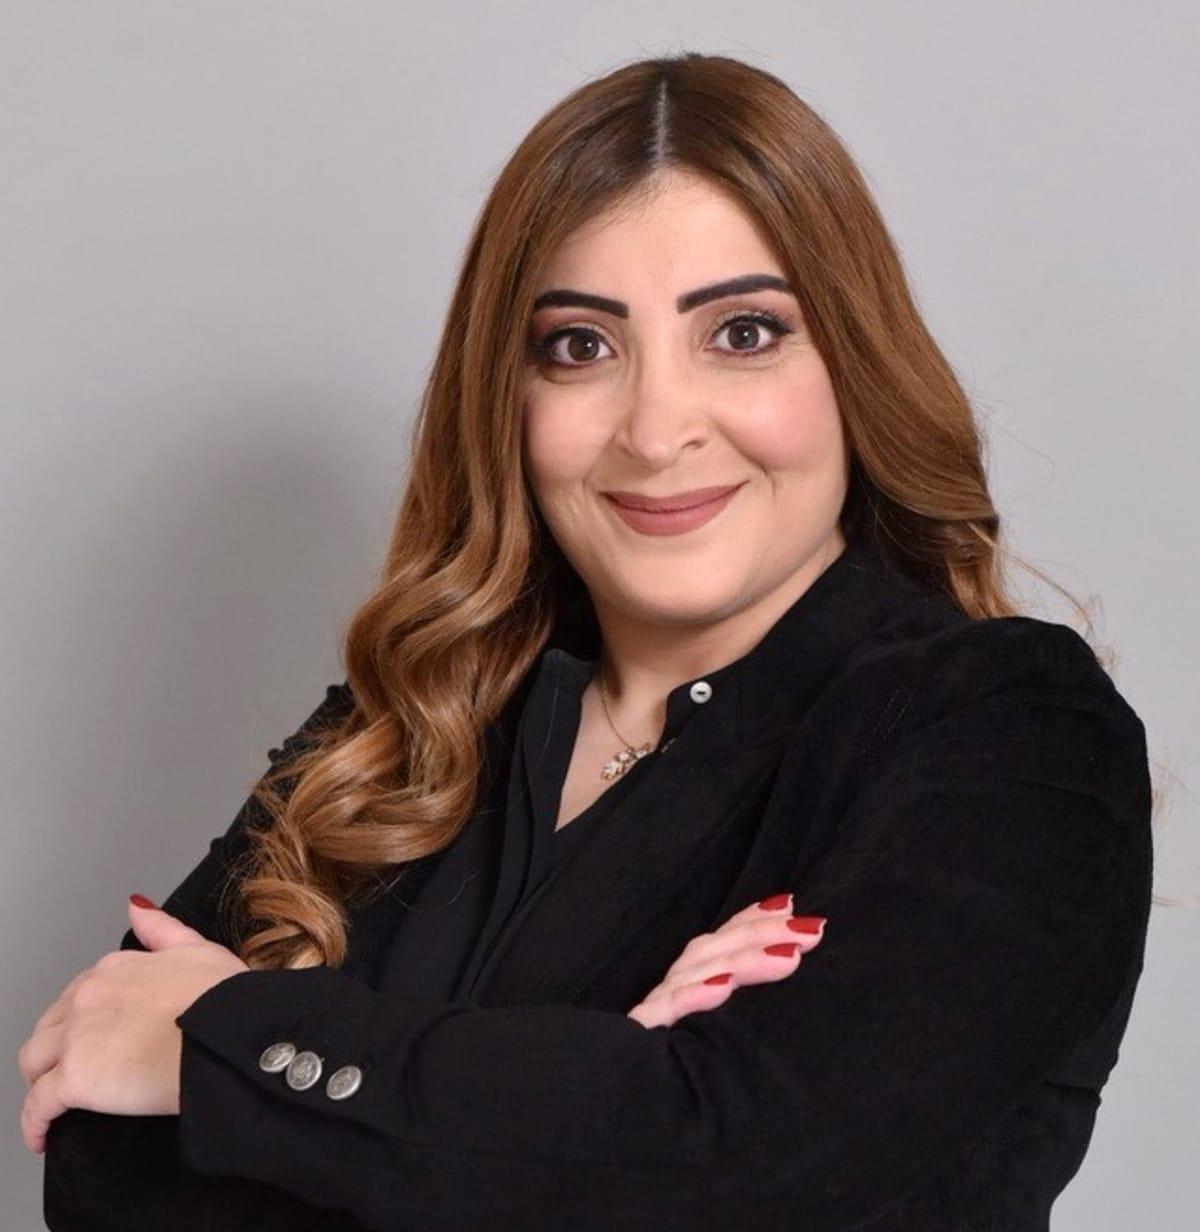 Nahil Hamdan